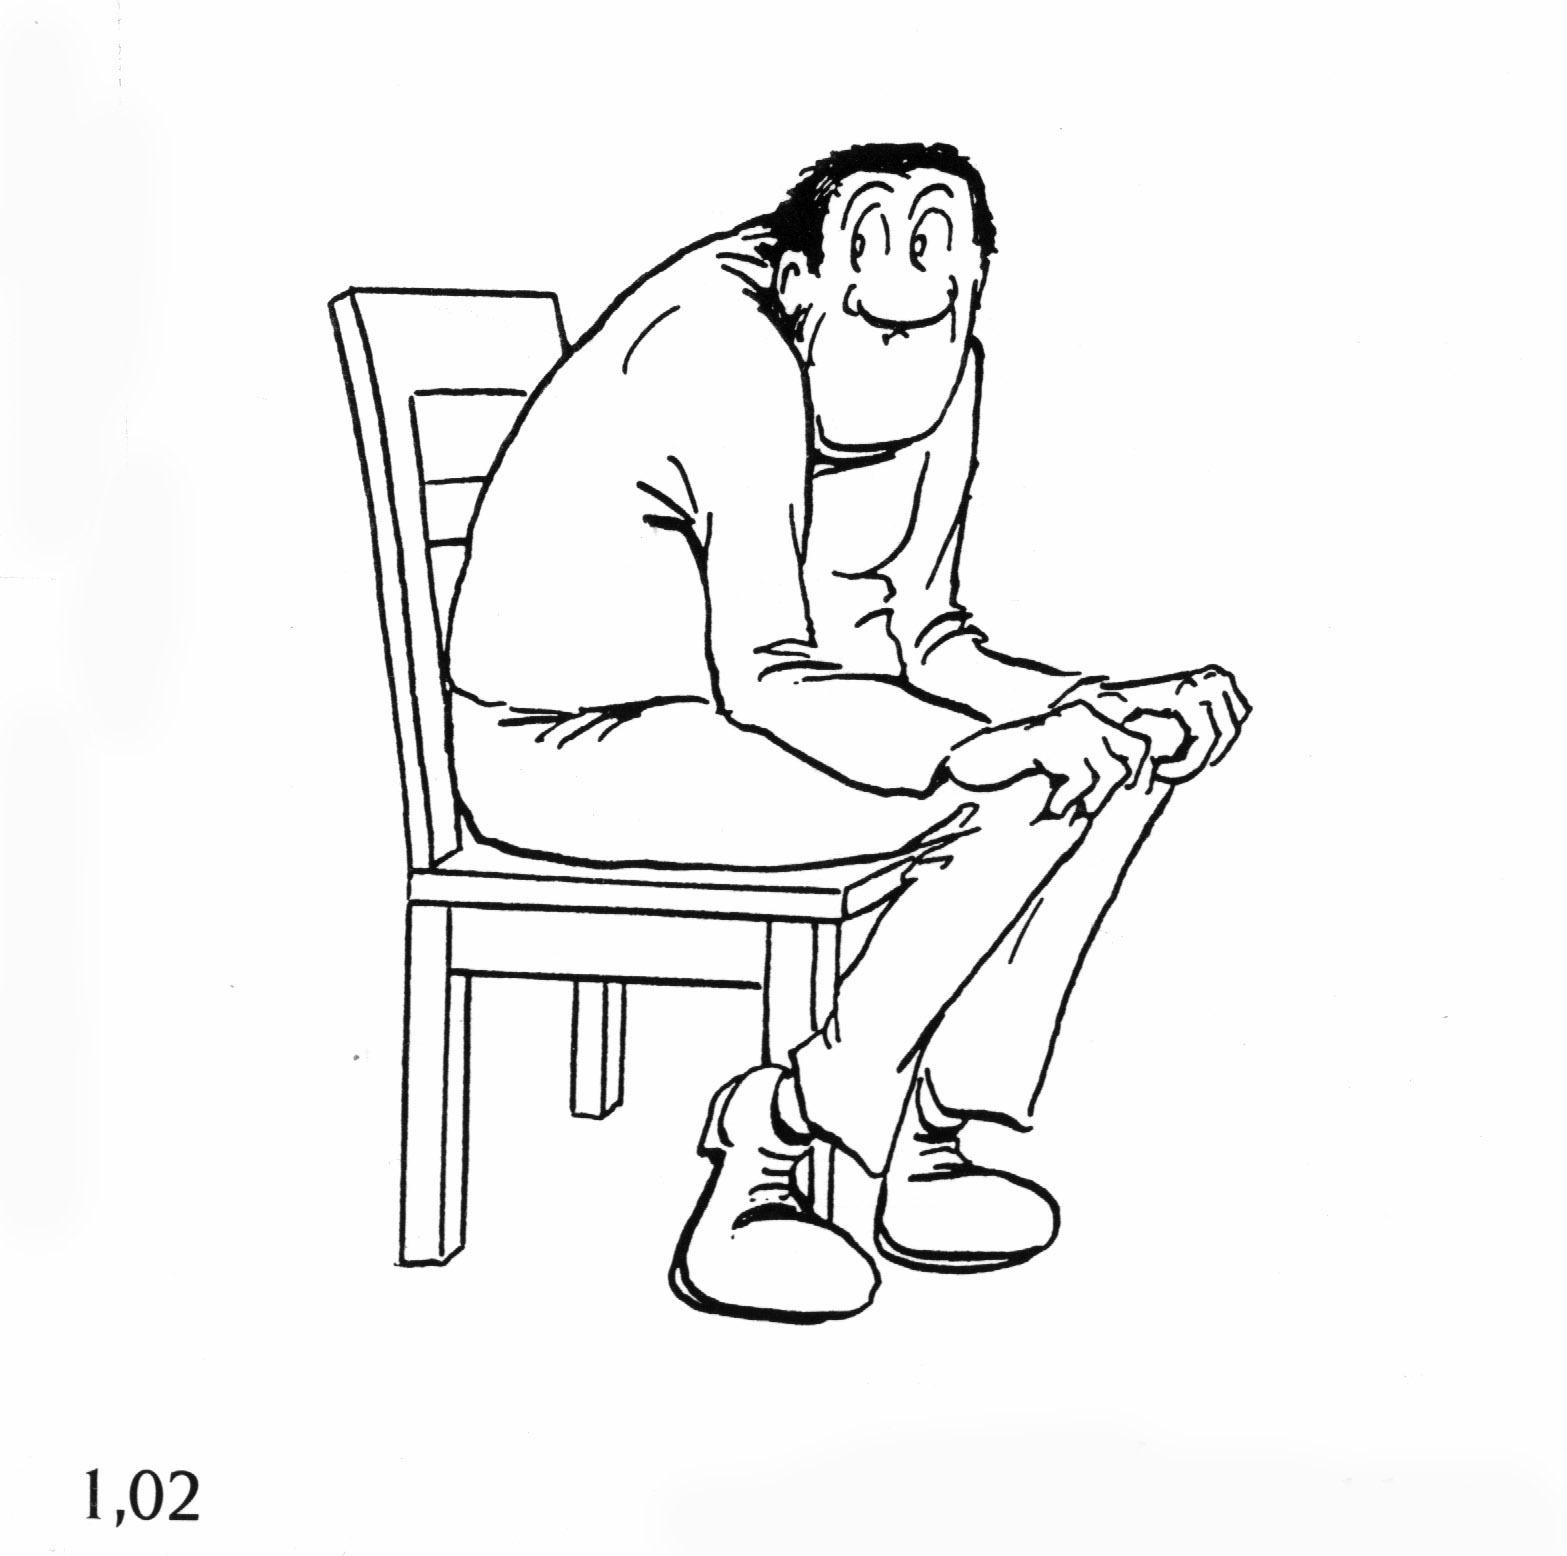 1.02 Беспокойство (тревога)